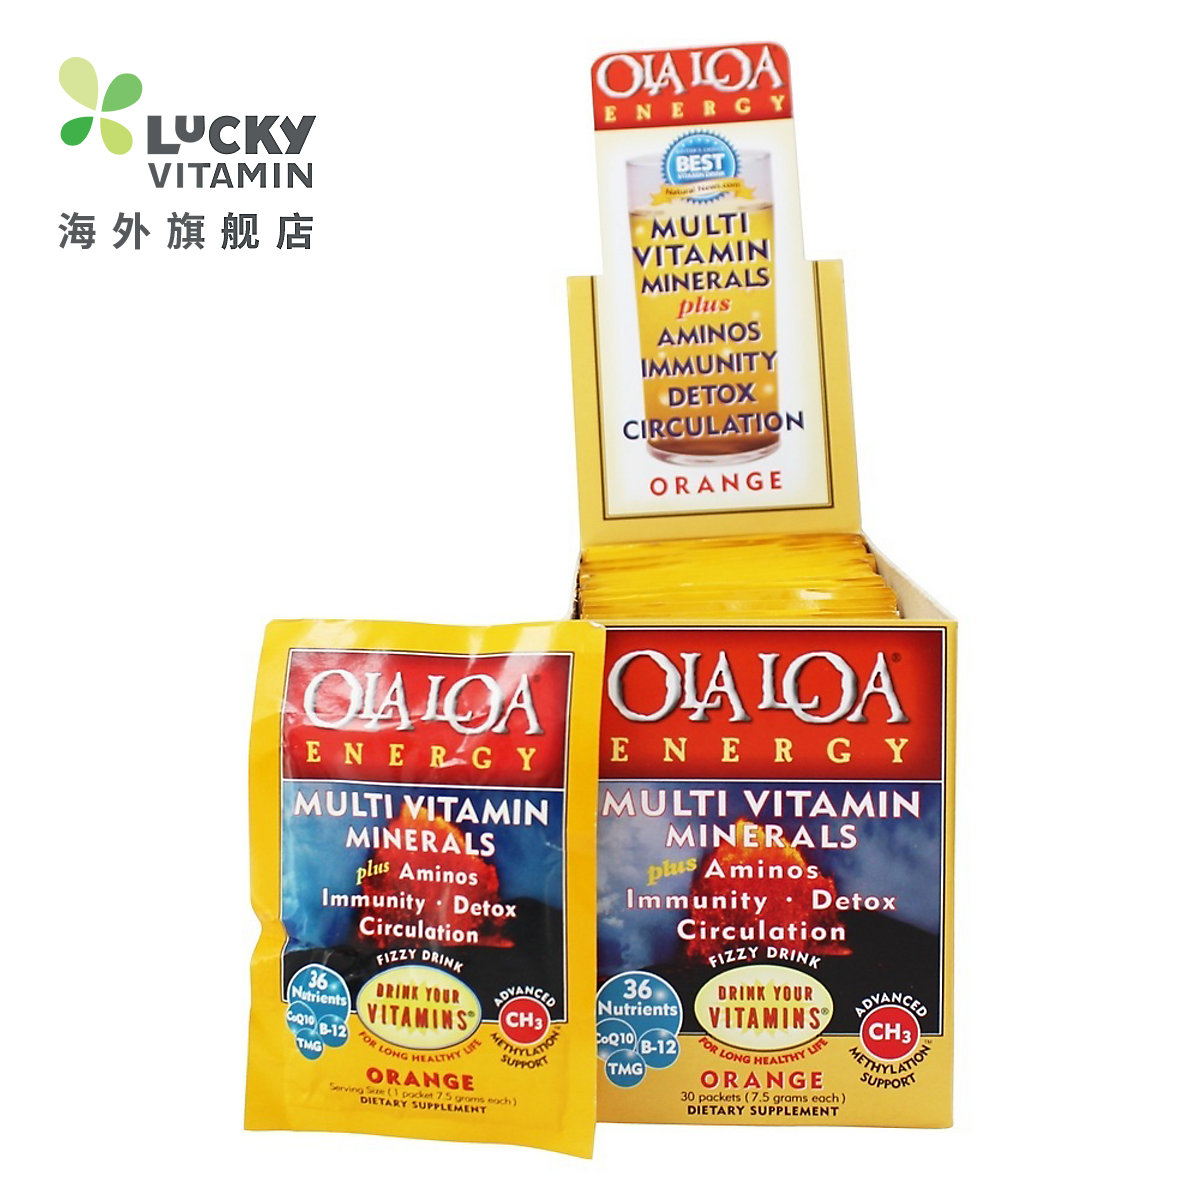 Ola Loa-能量多维生素泡腾片橙-30 x 7 g 数据包